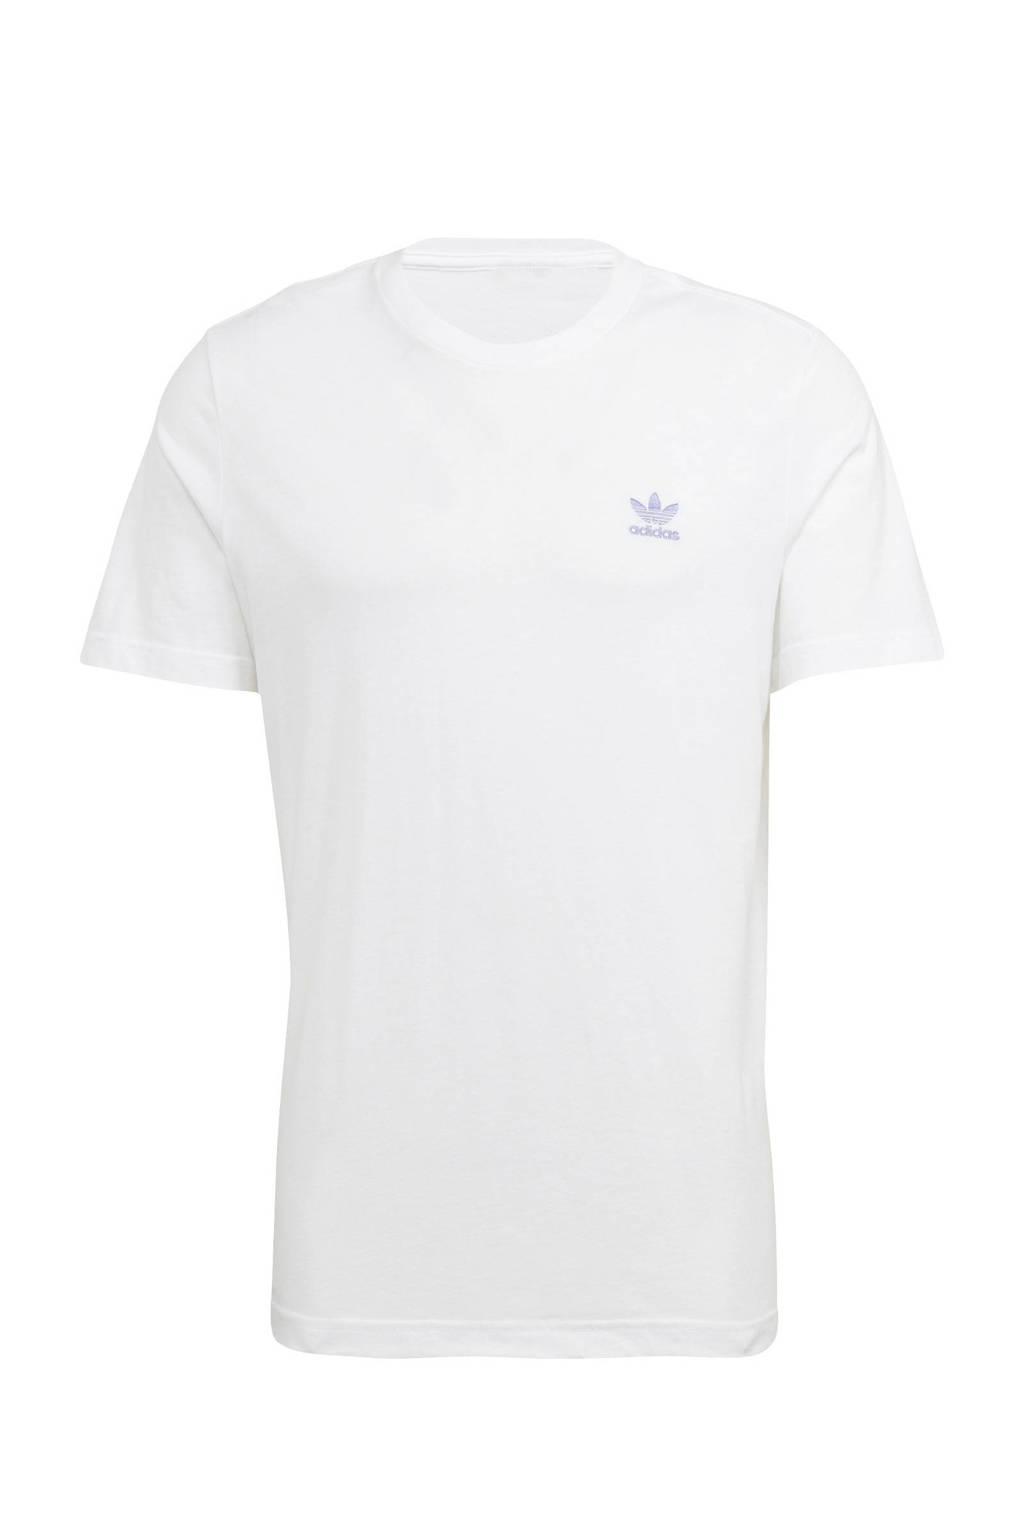 adidas Originals Adicolor T-shirt wit/lila, Wit/lila